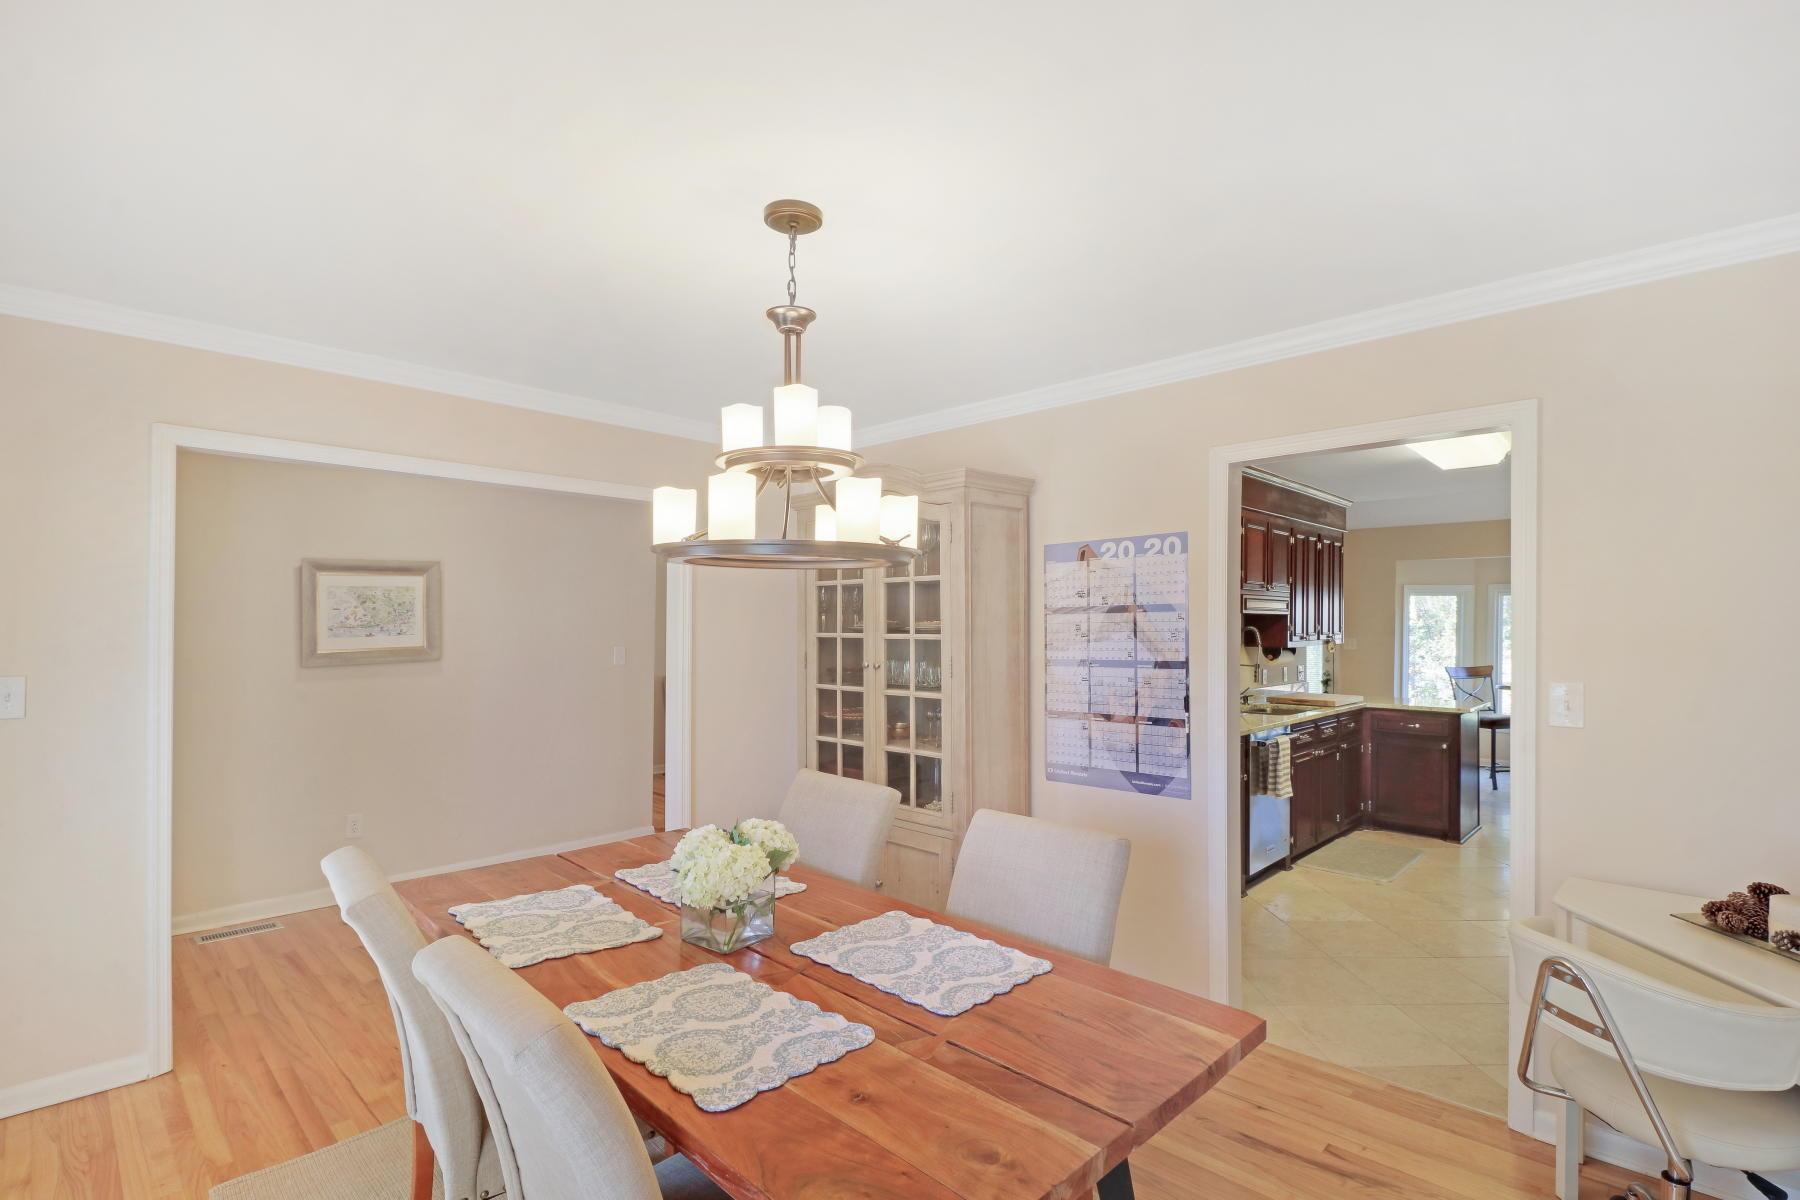 Harrison Acres Homes For Sale - 51 Markfield, Charleston, SC - 5